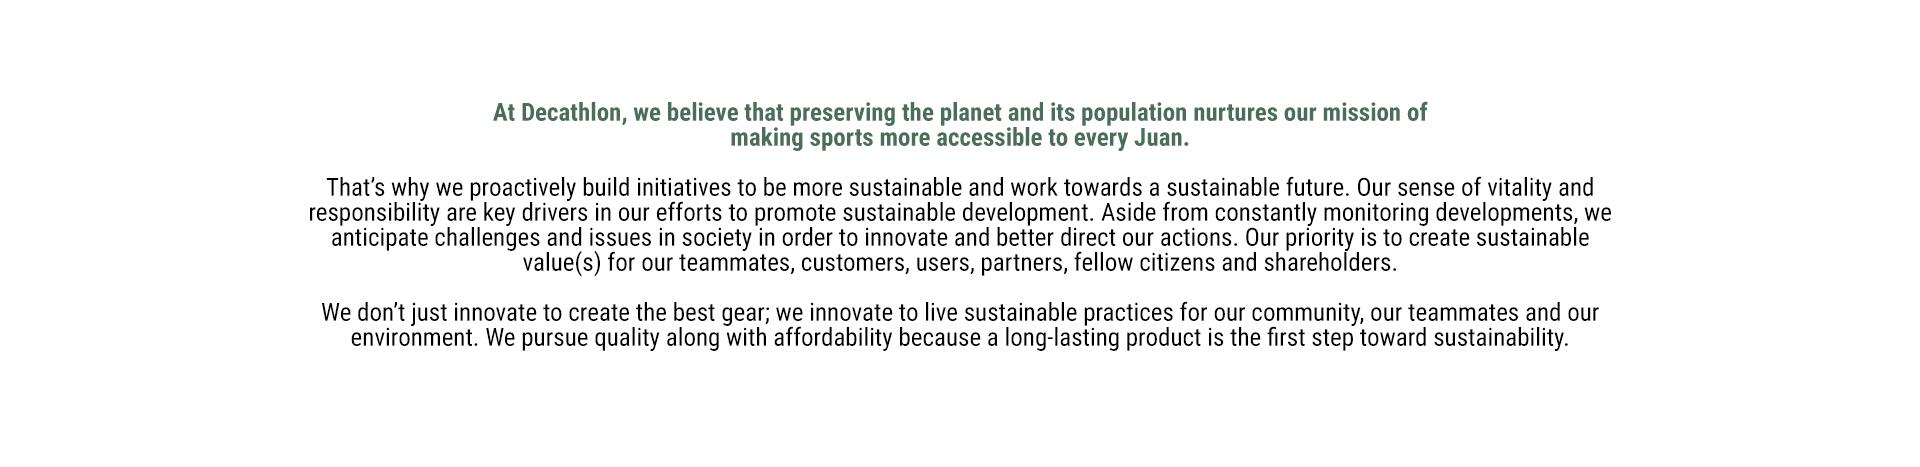 Decathlon Philippines Sustainability